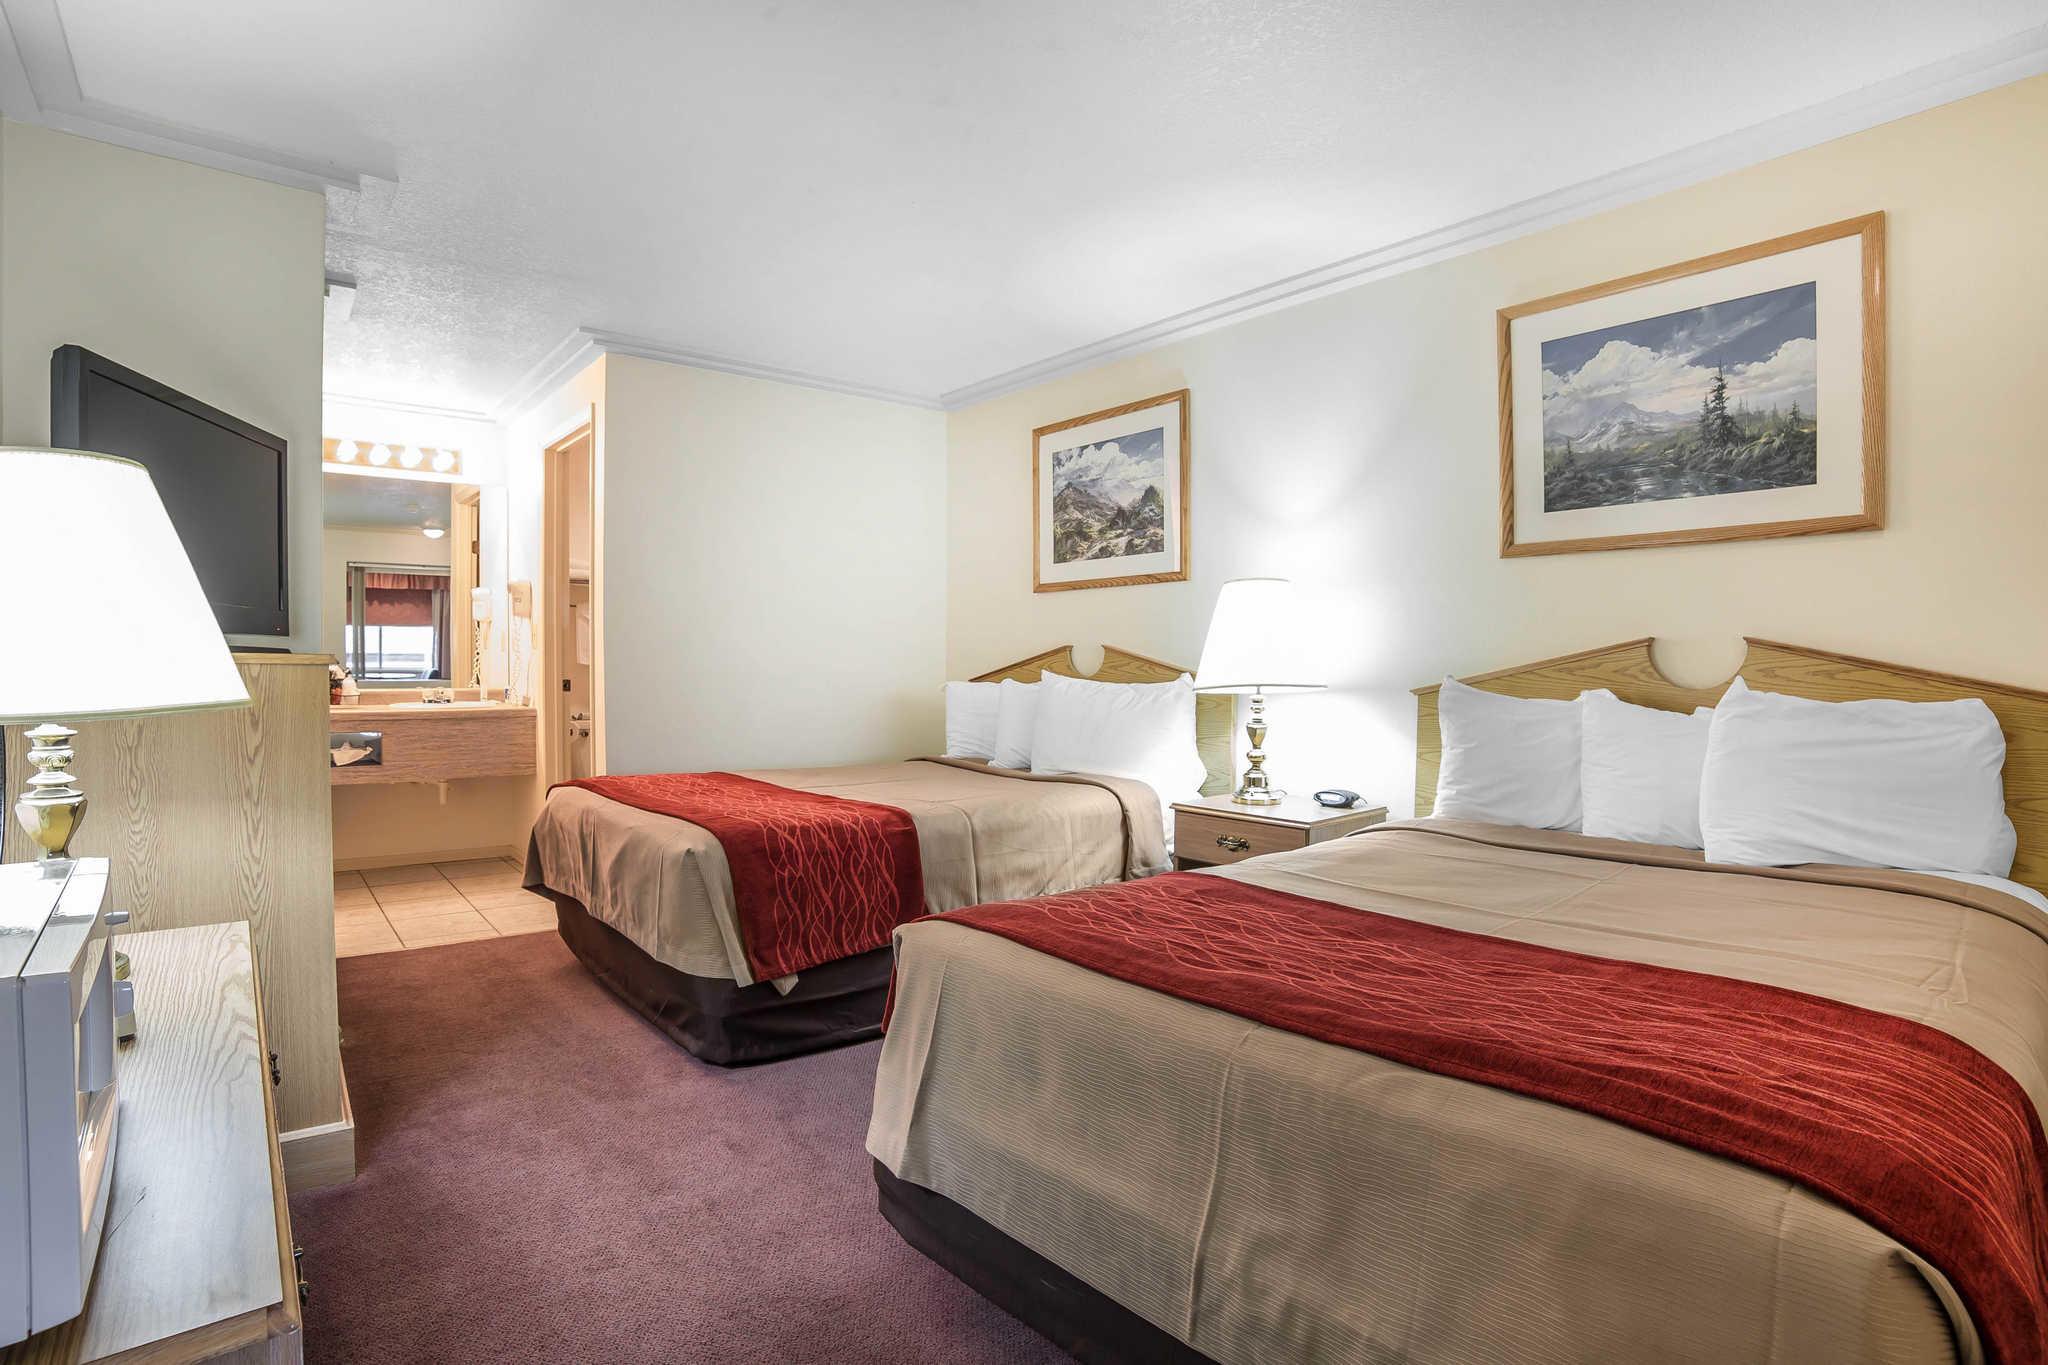 Rodeway Inn Pronghorn Lodge image 11